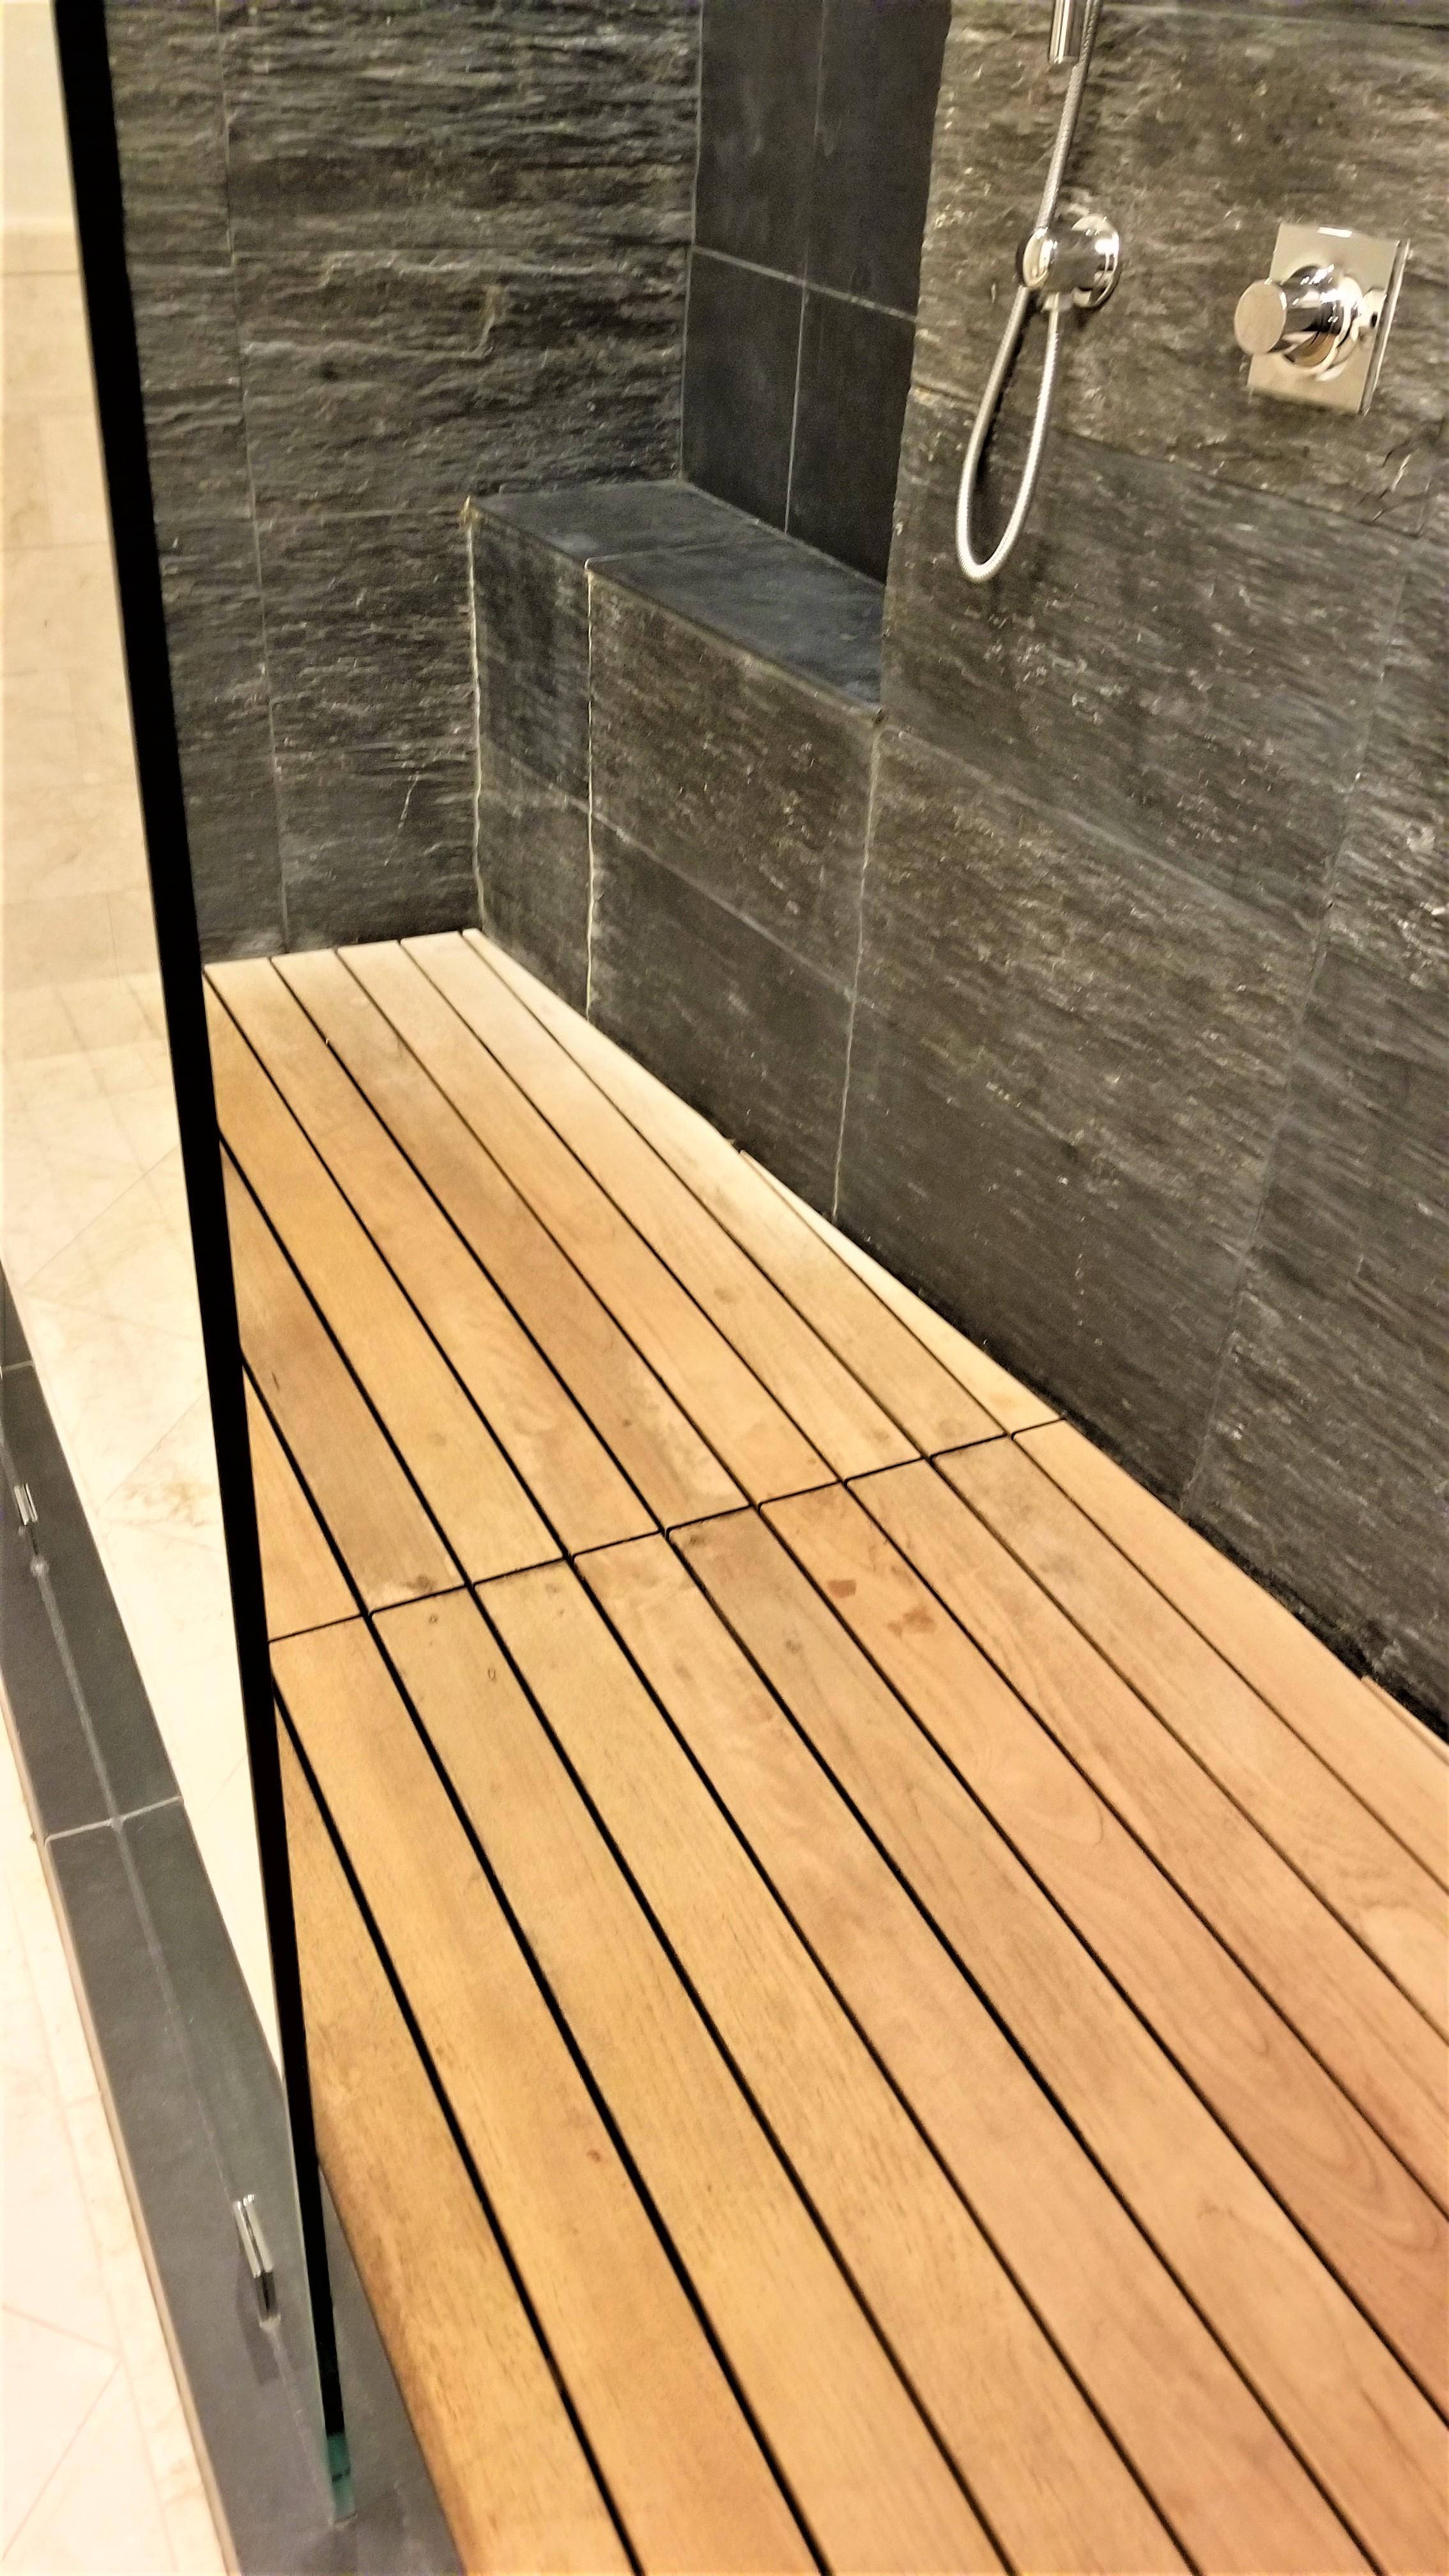 New Life For A Teak Wood Shower Floor